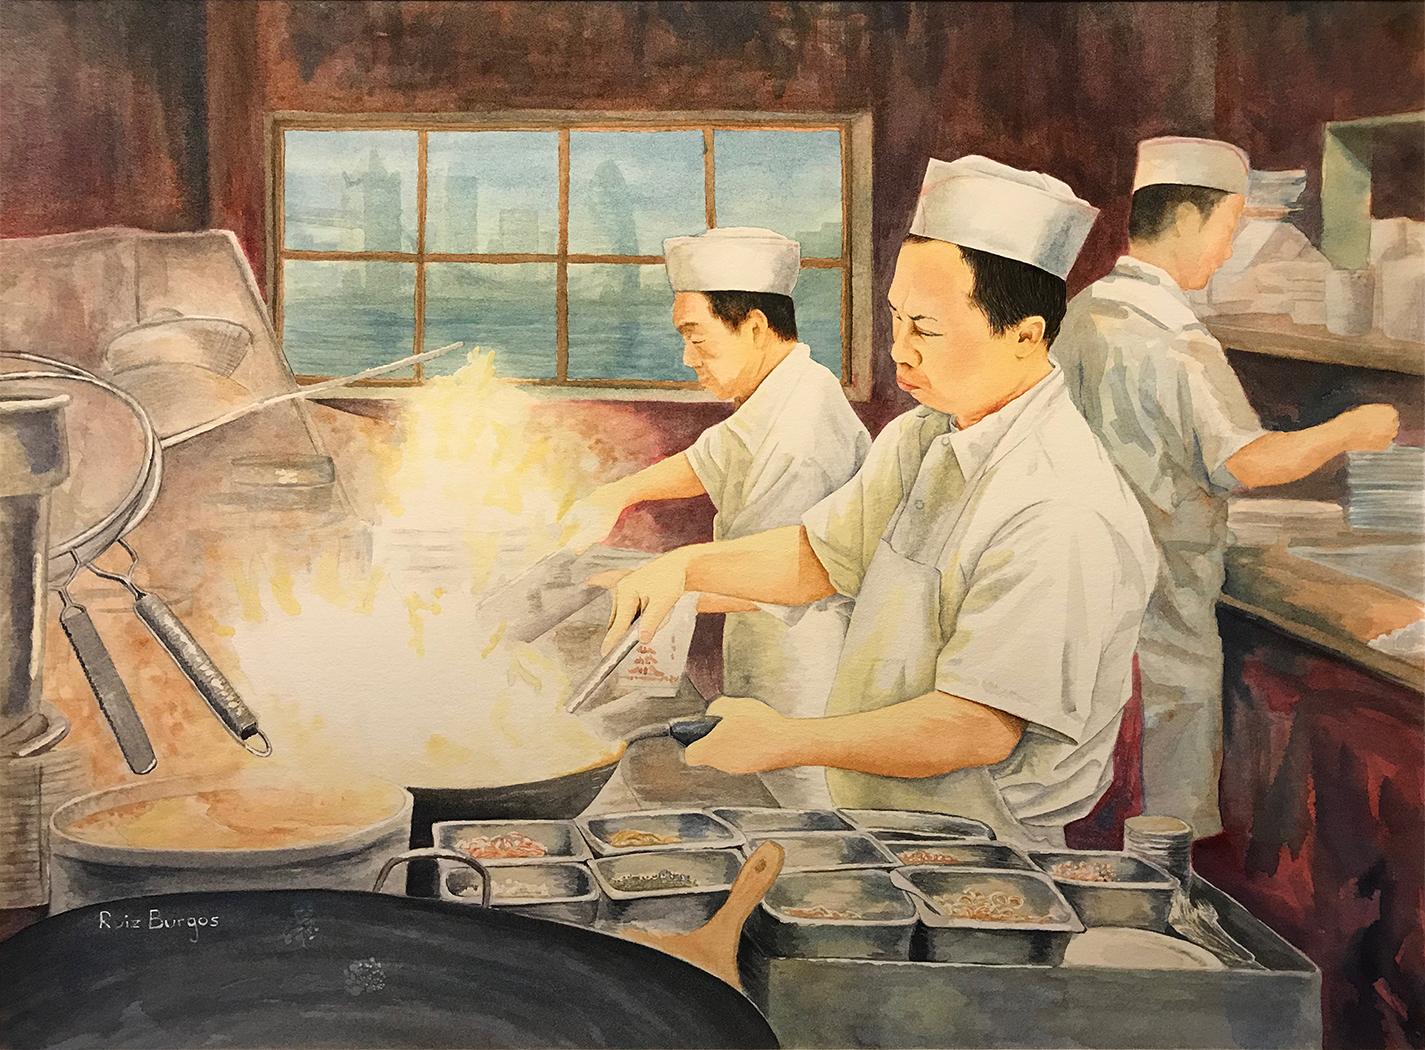 People's Choice Award Winner: 'Wok Cuisine' by Francisco Carlos Ruiz Burgos